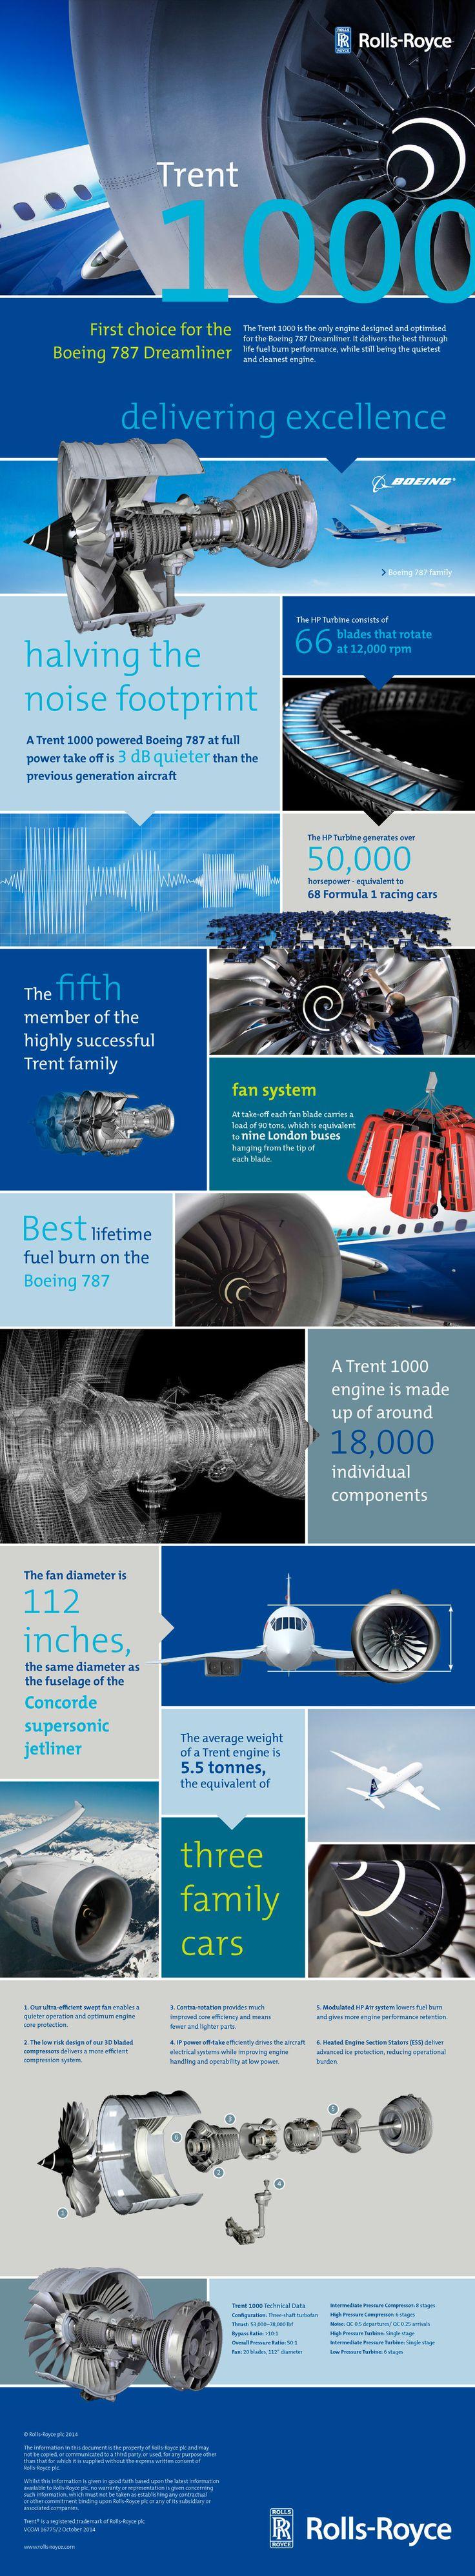 Rolls royce trent 1000 on Pinterest | Rolls royce trent, Boeing ...